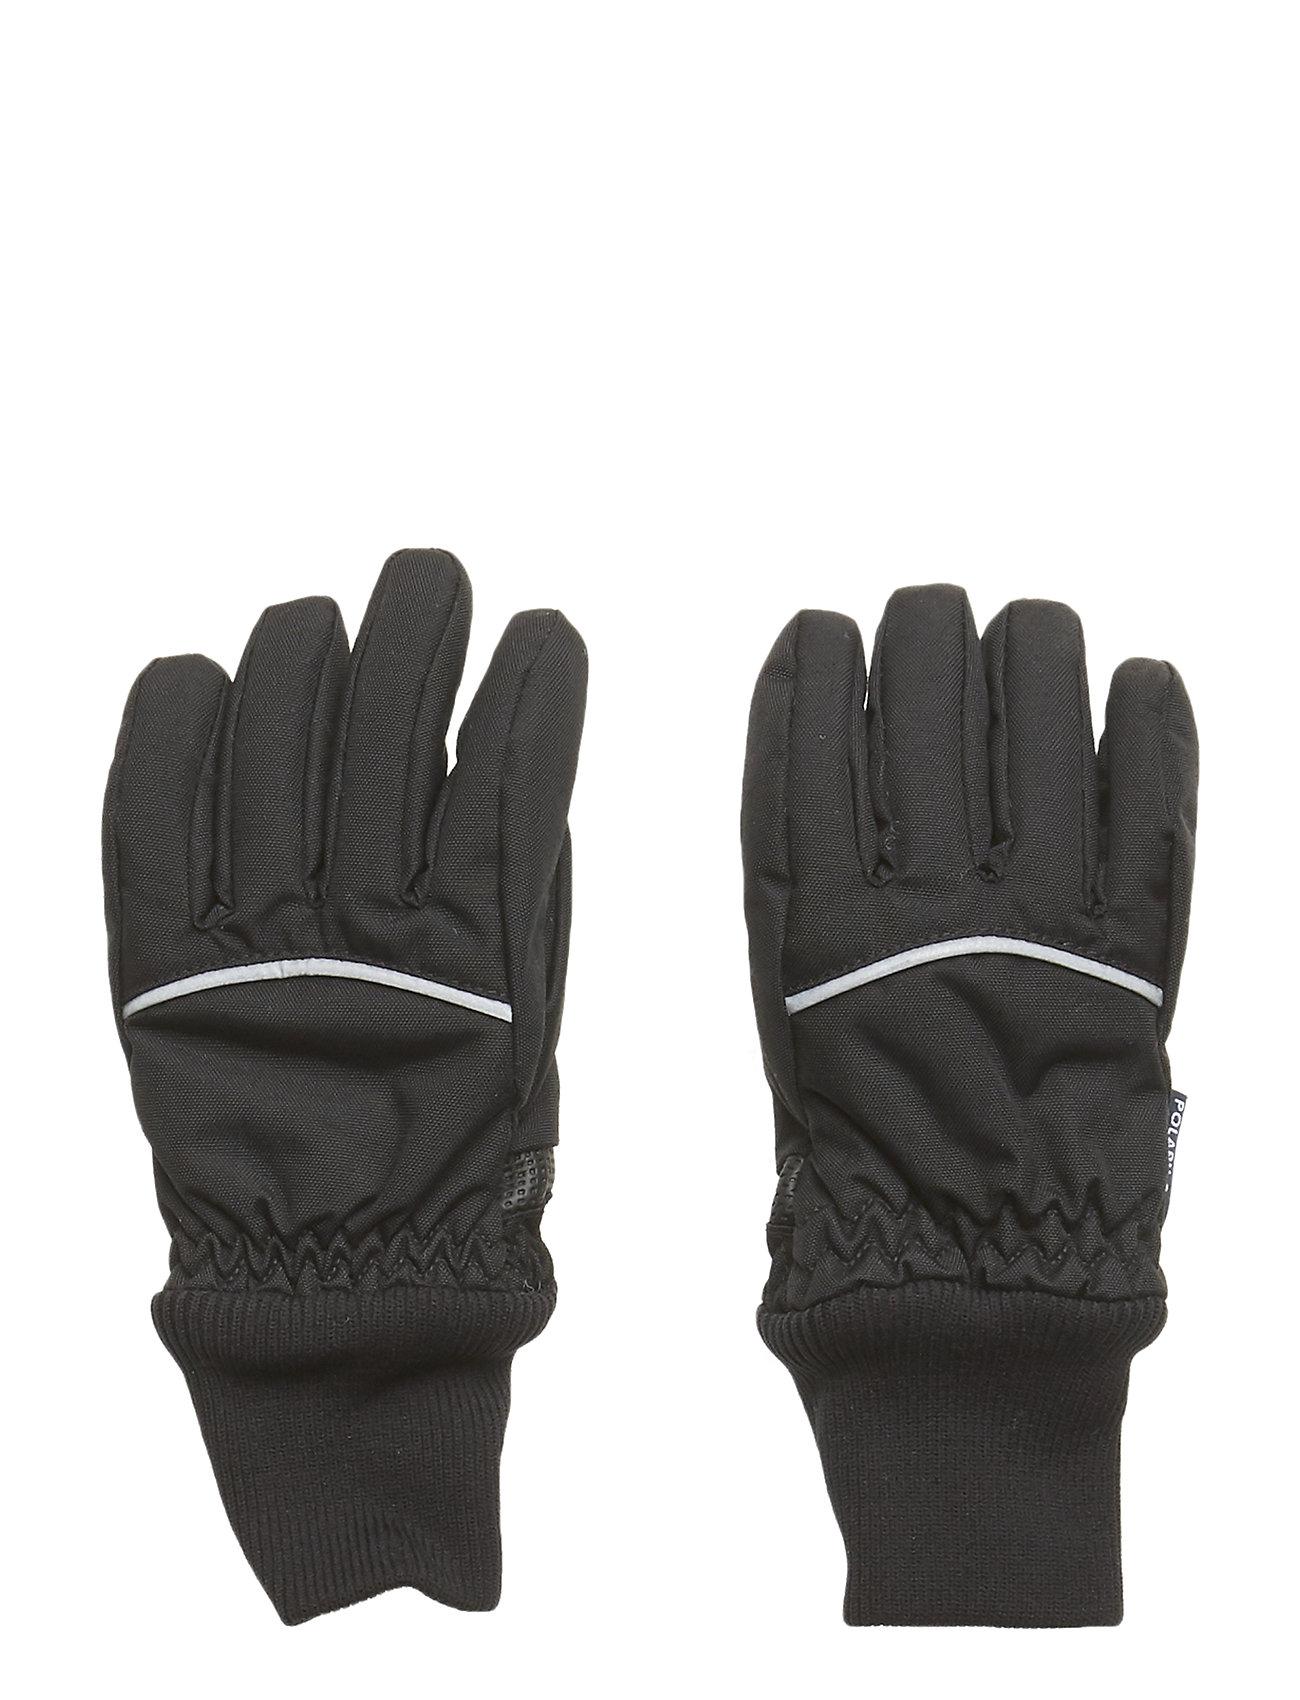 Polarn O. Pyret Glove Solid